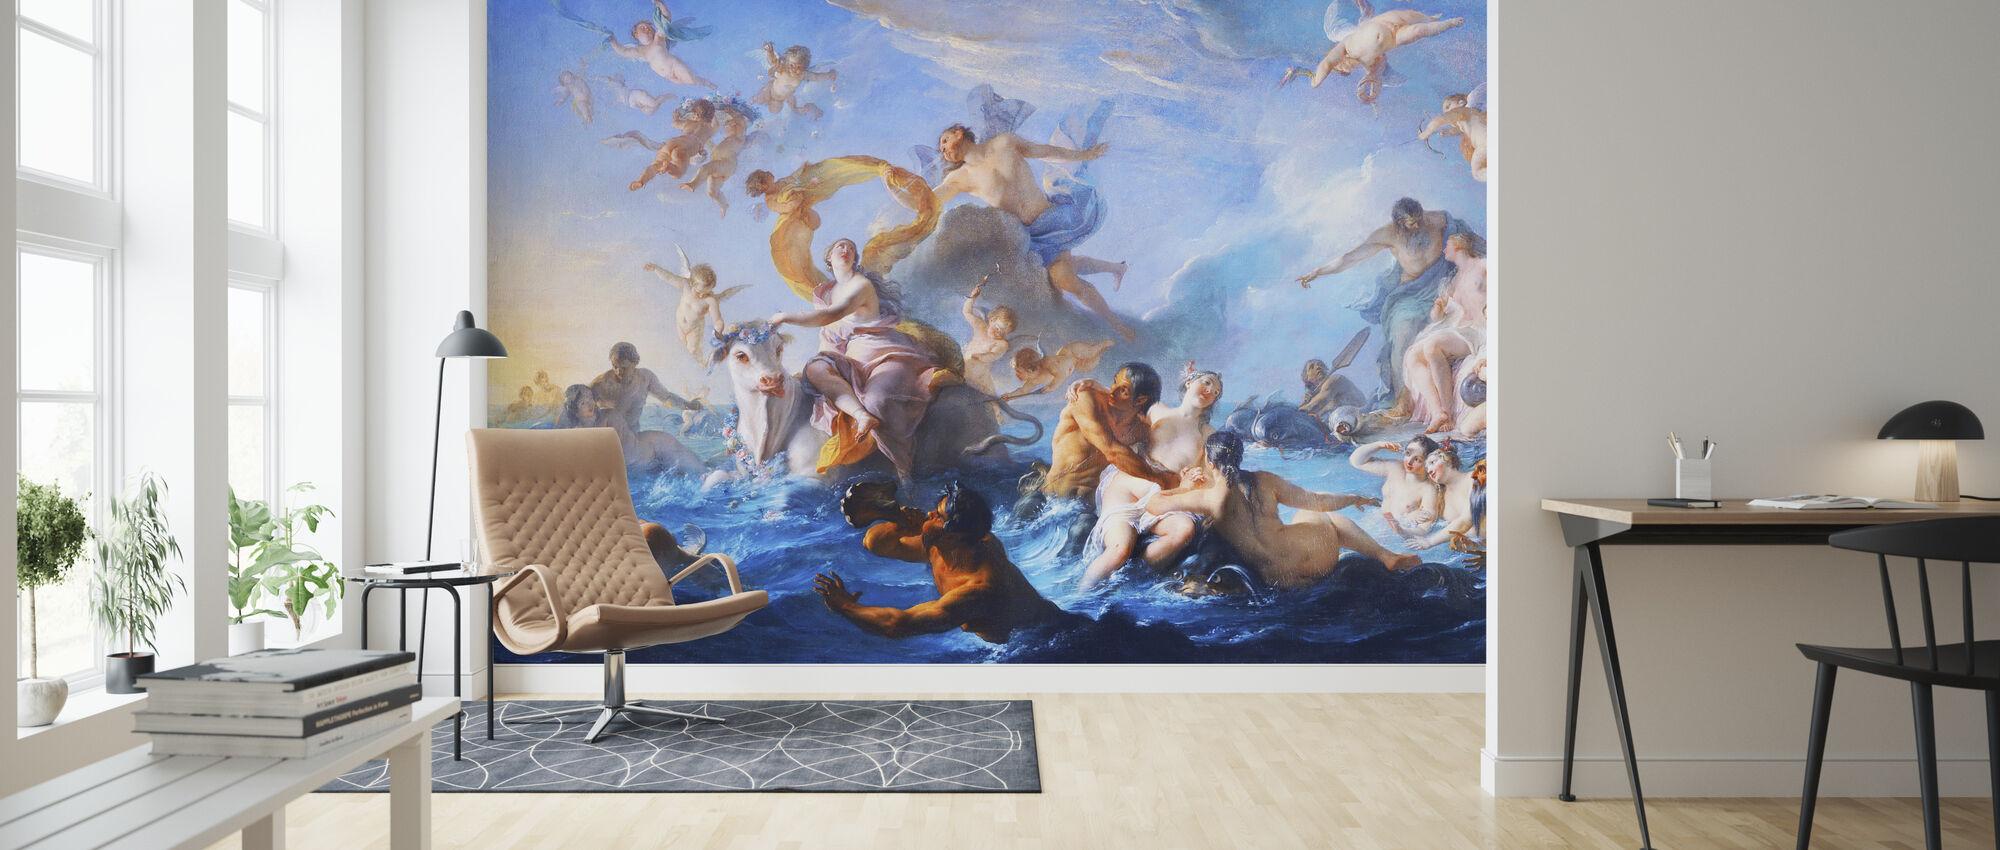 Abduction of Europa - Cora Wandel - Wallpaper - Living Room